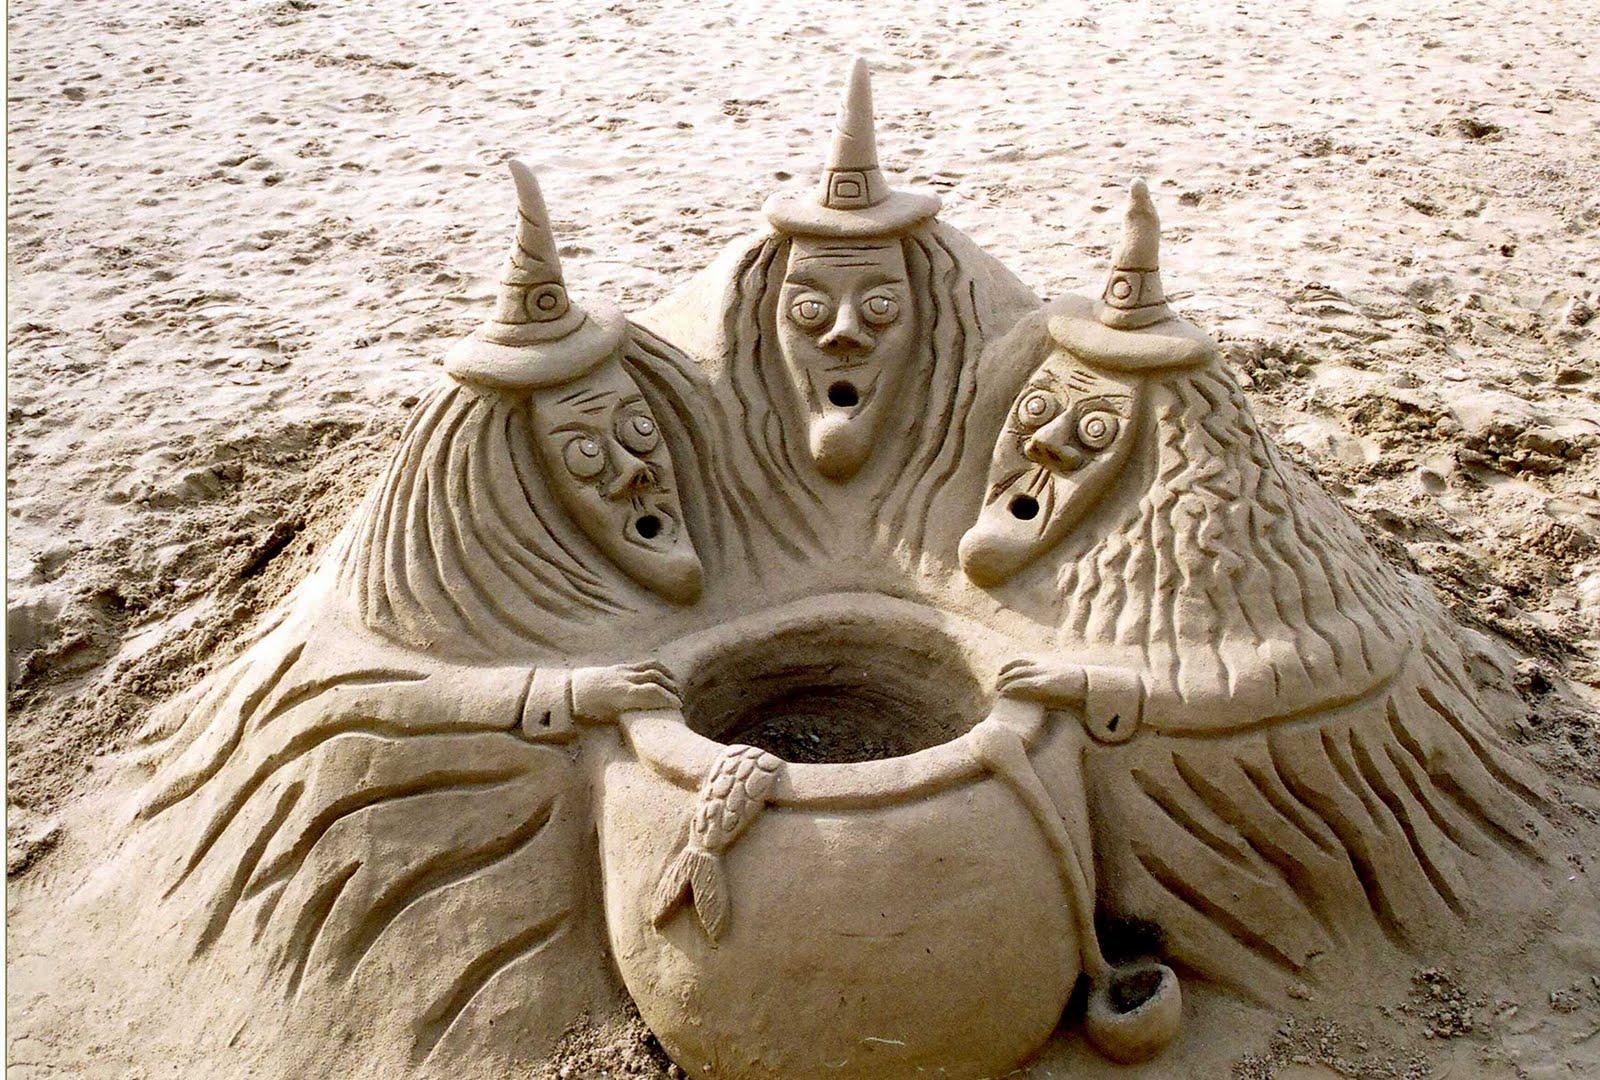 figuras en la arena  Sitges05+FigurasArena1